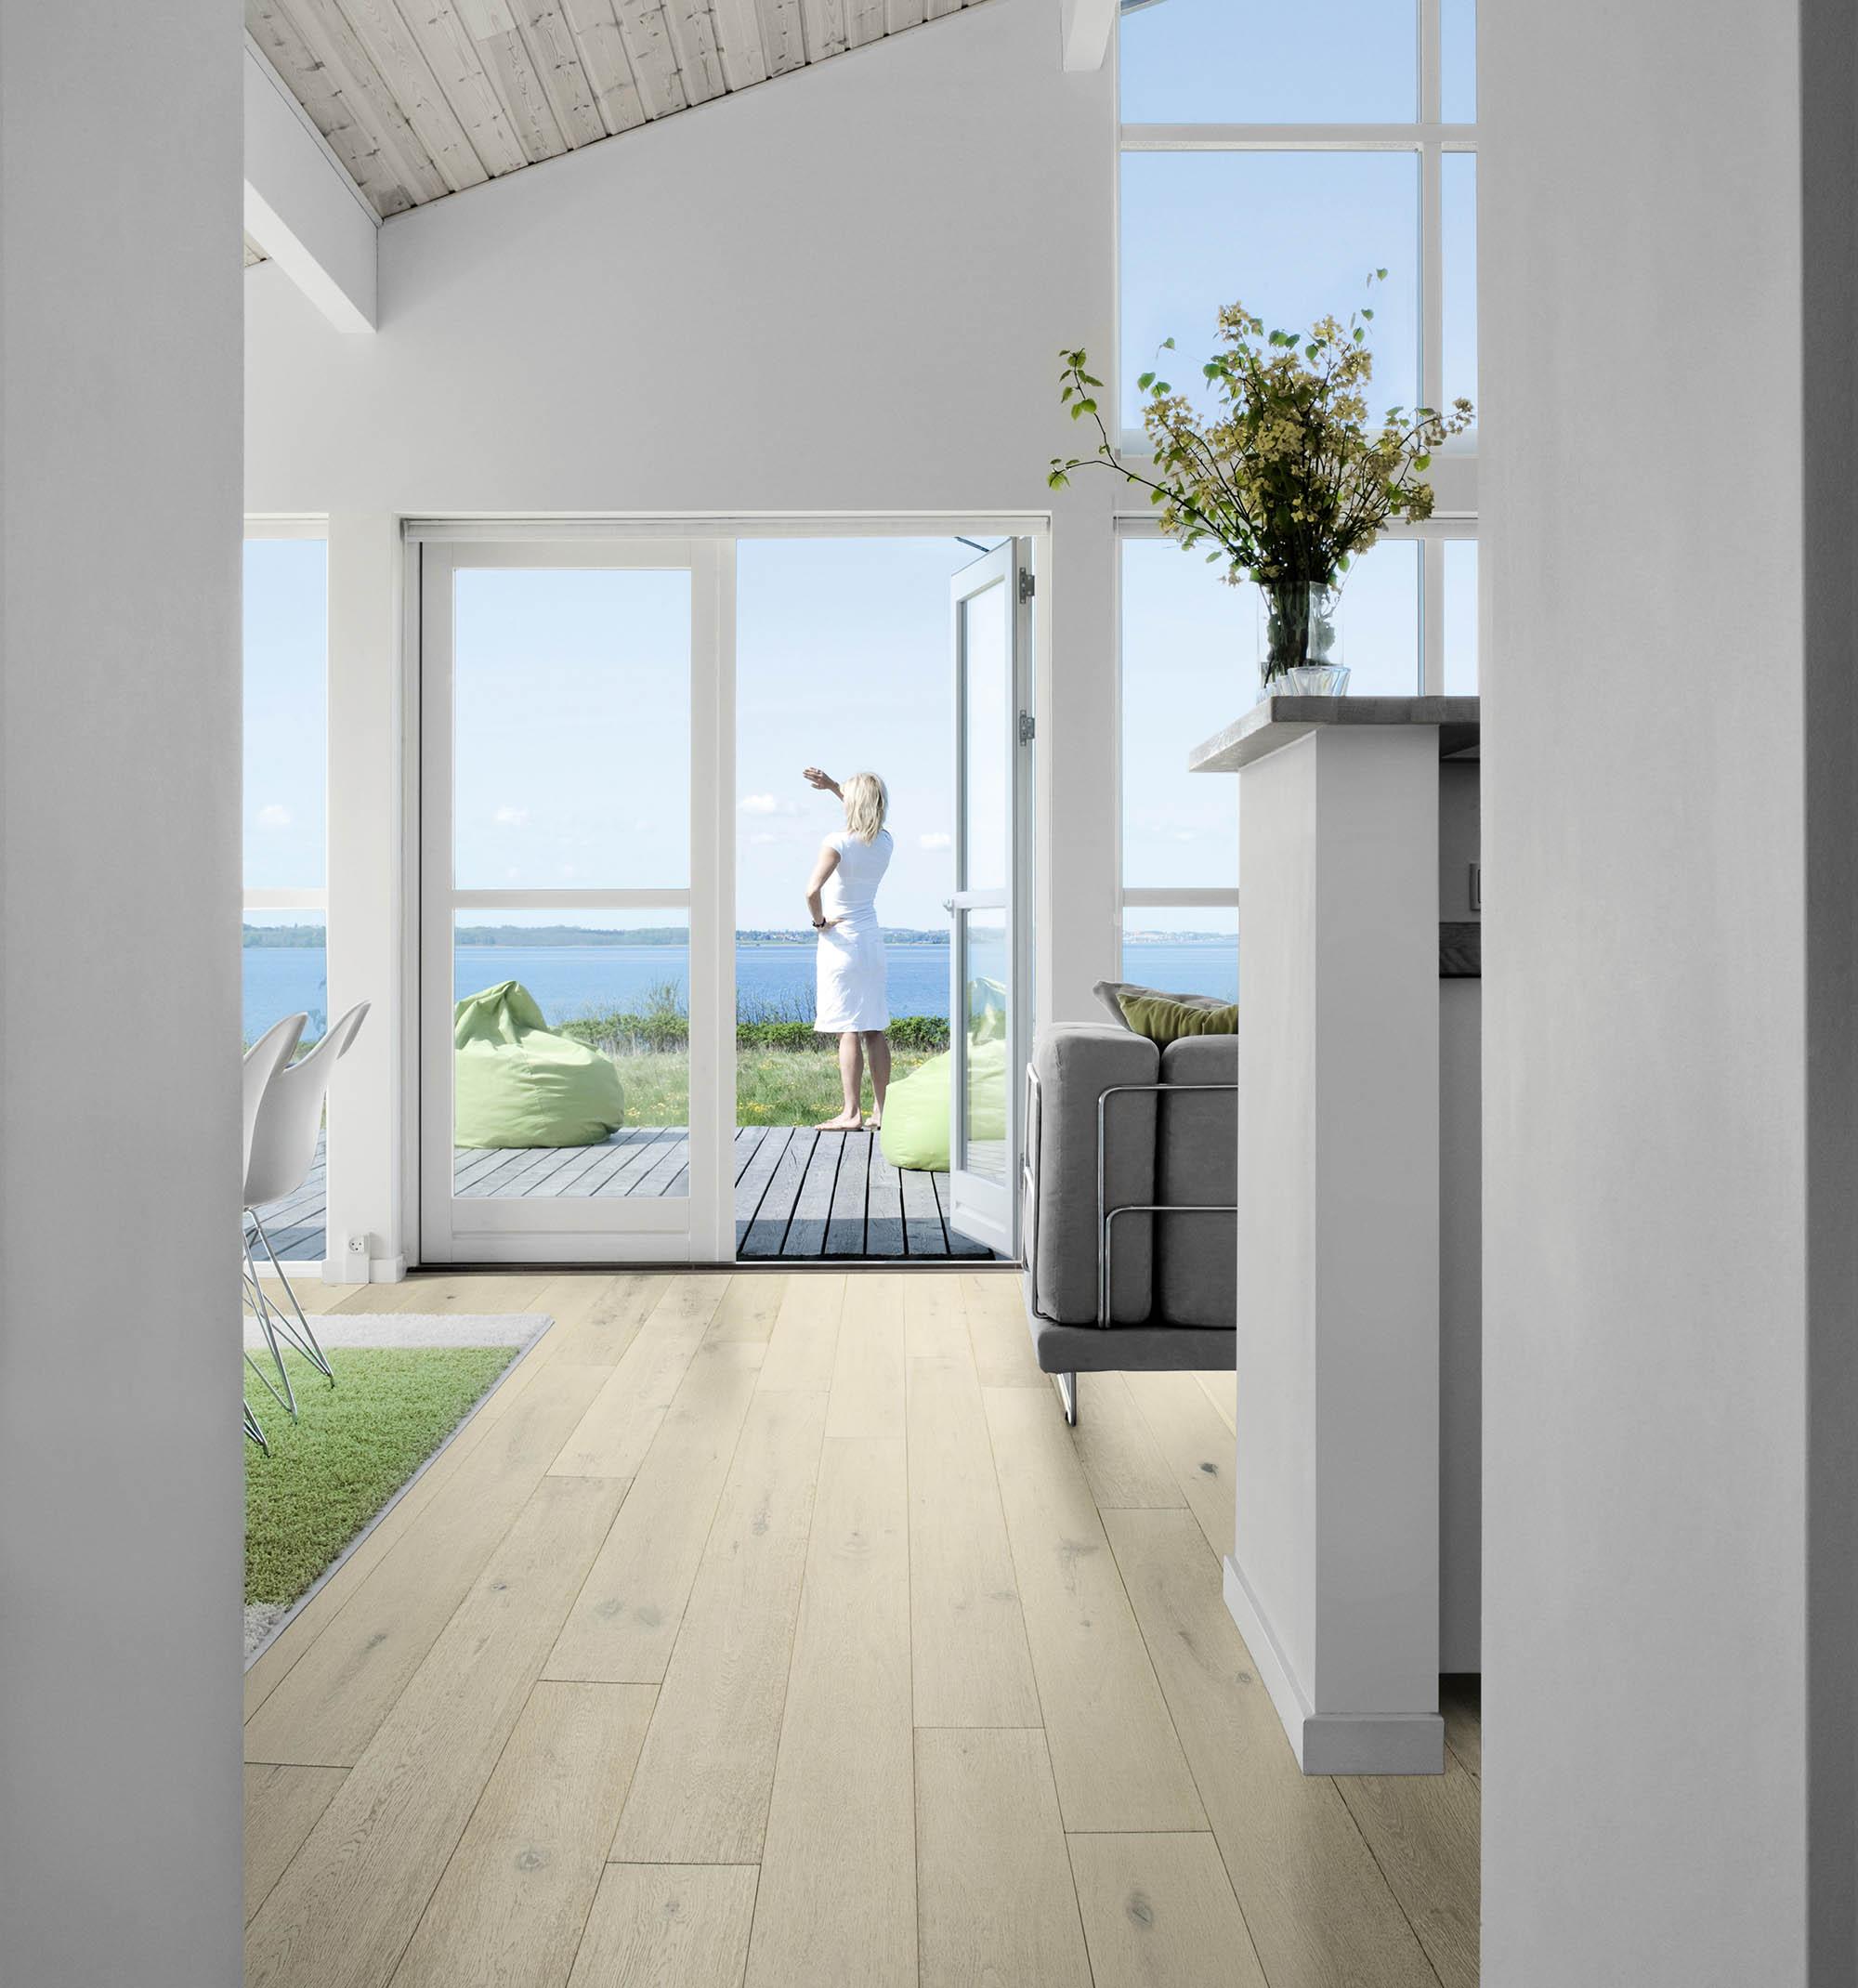 Chene grigio room view.jpg